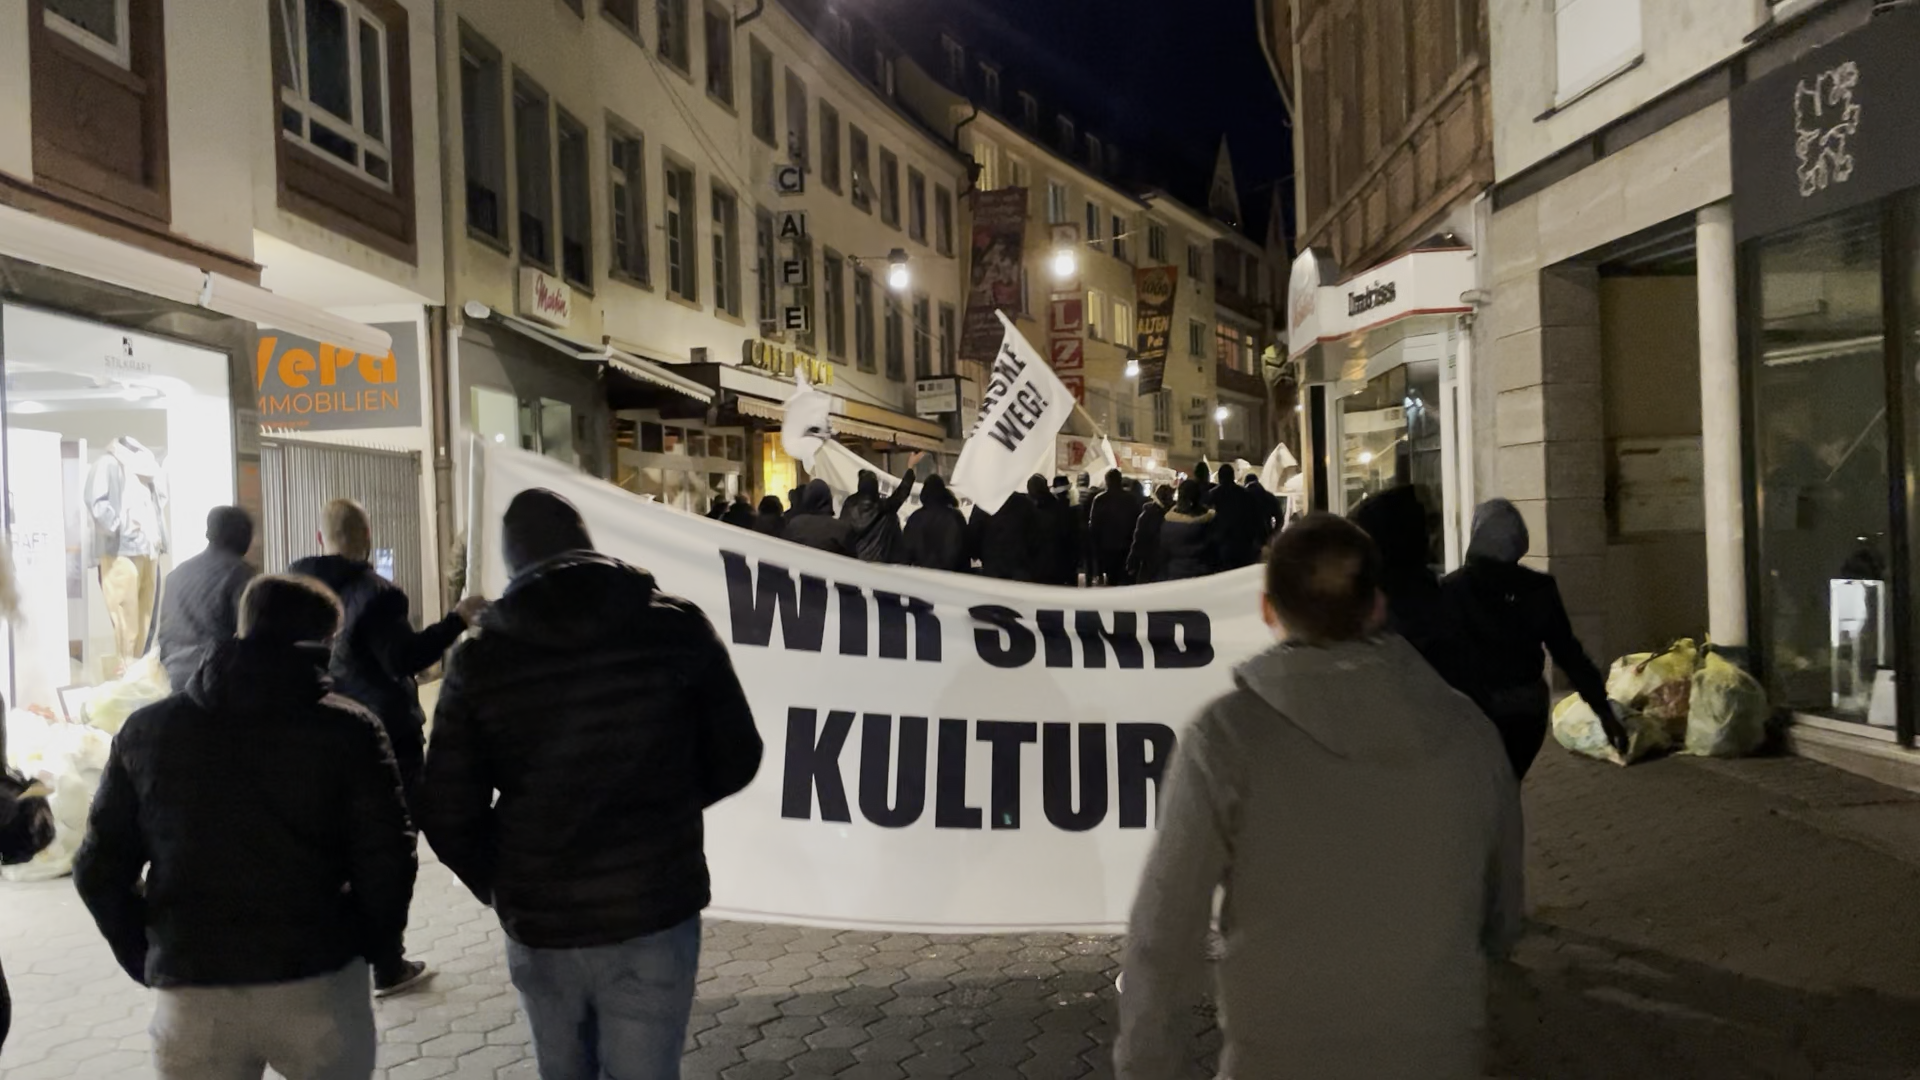 Flashmob-Demo in Aschaffenburg